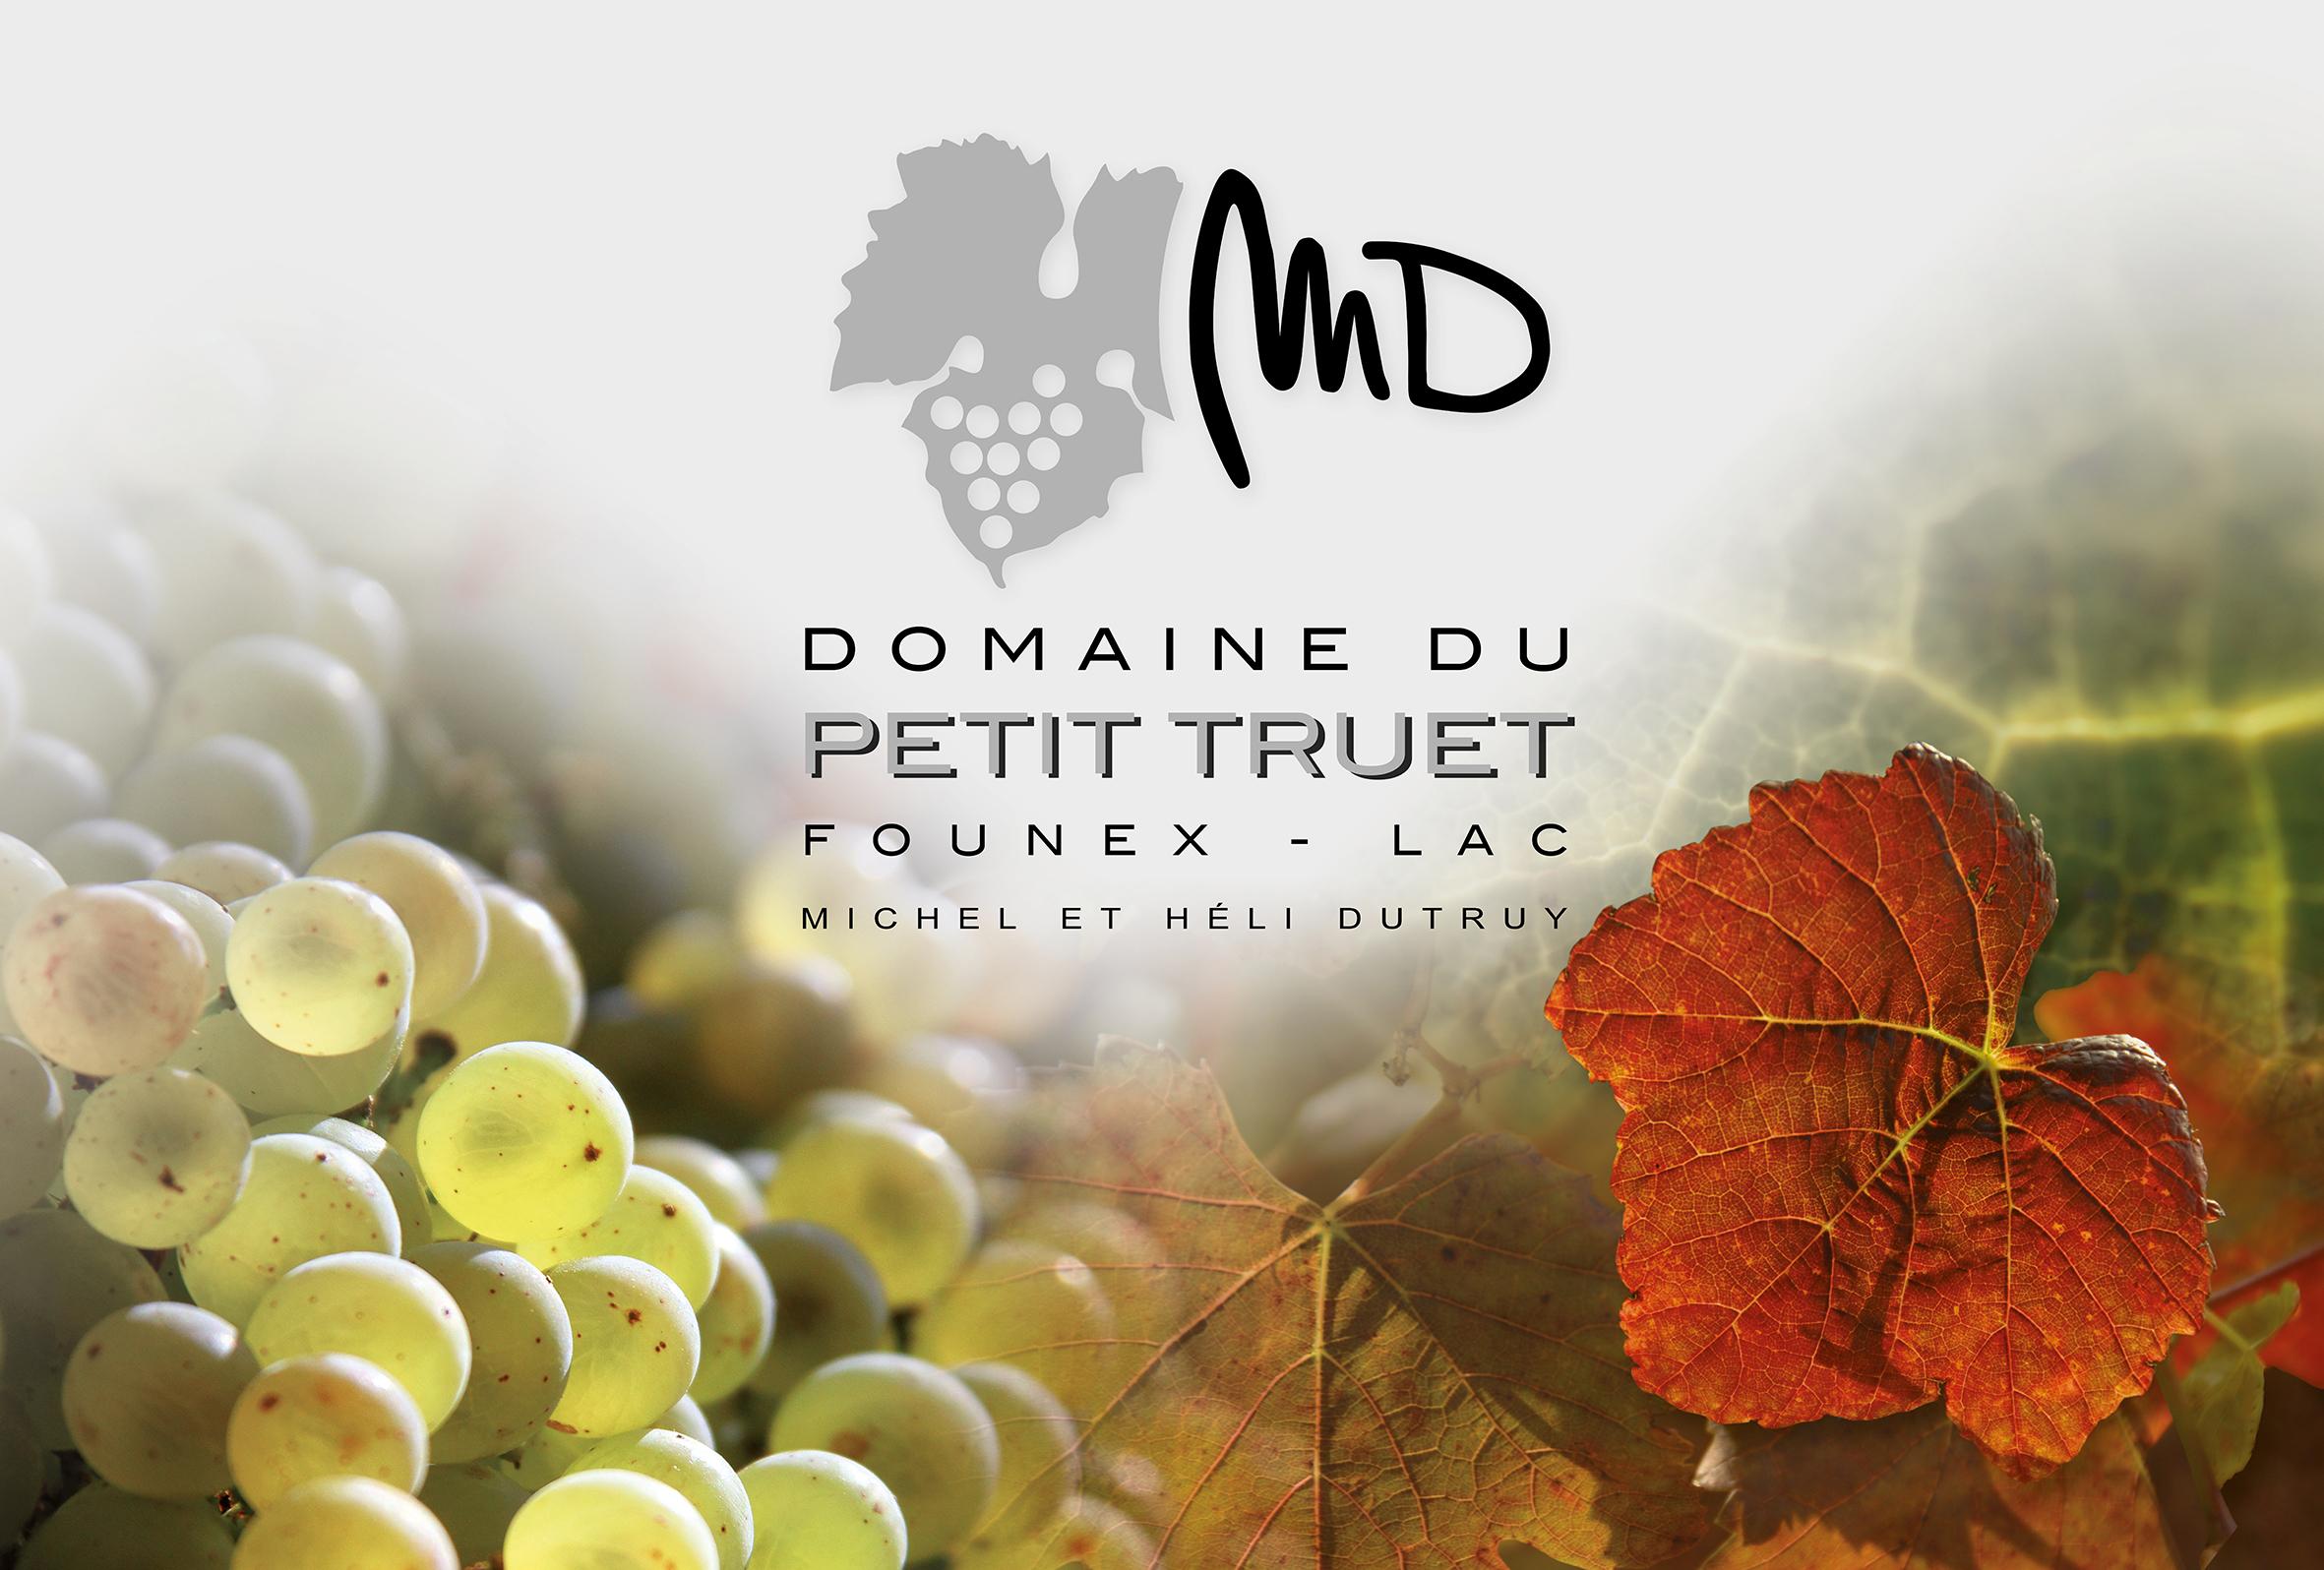 Domaine du Petit-Truet